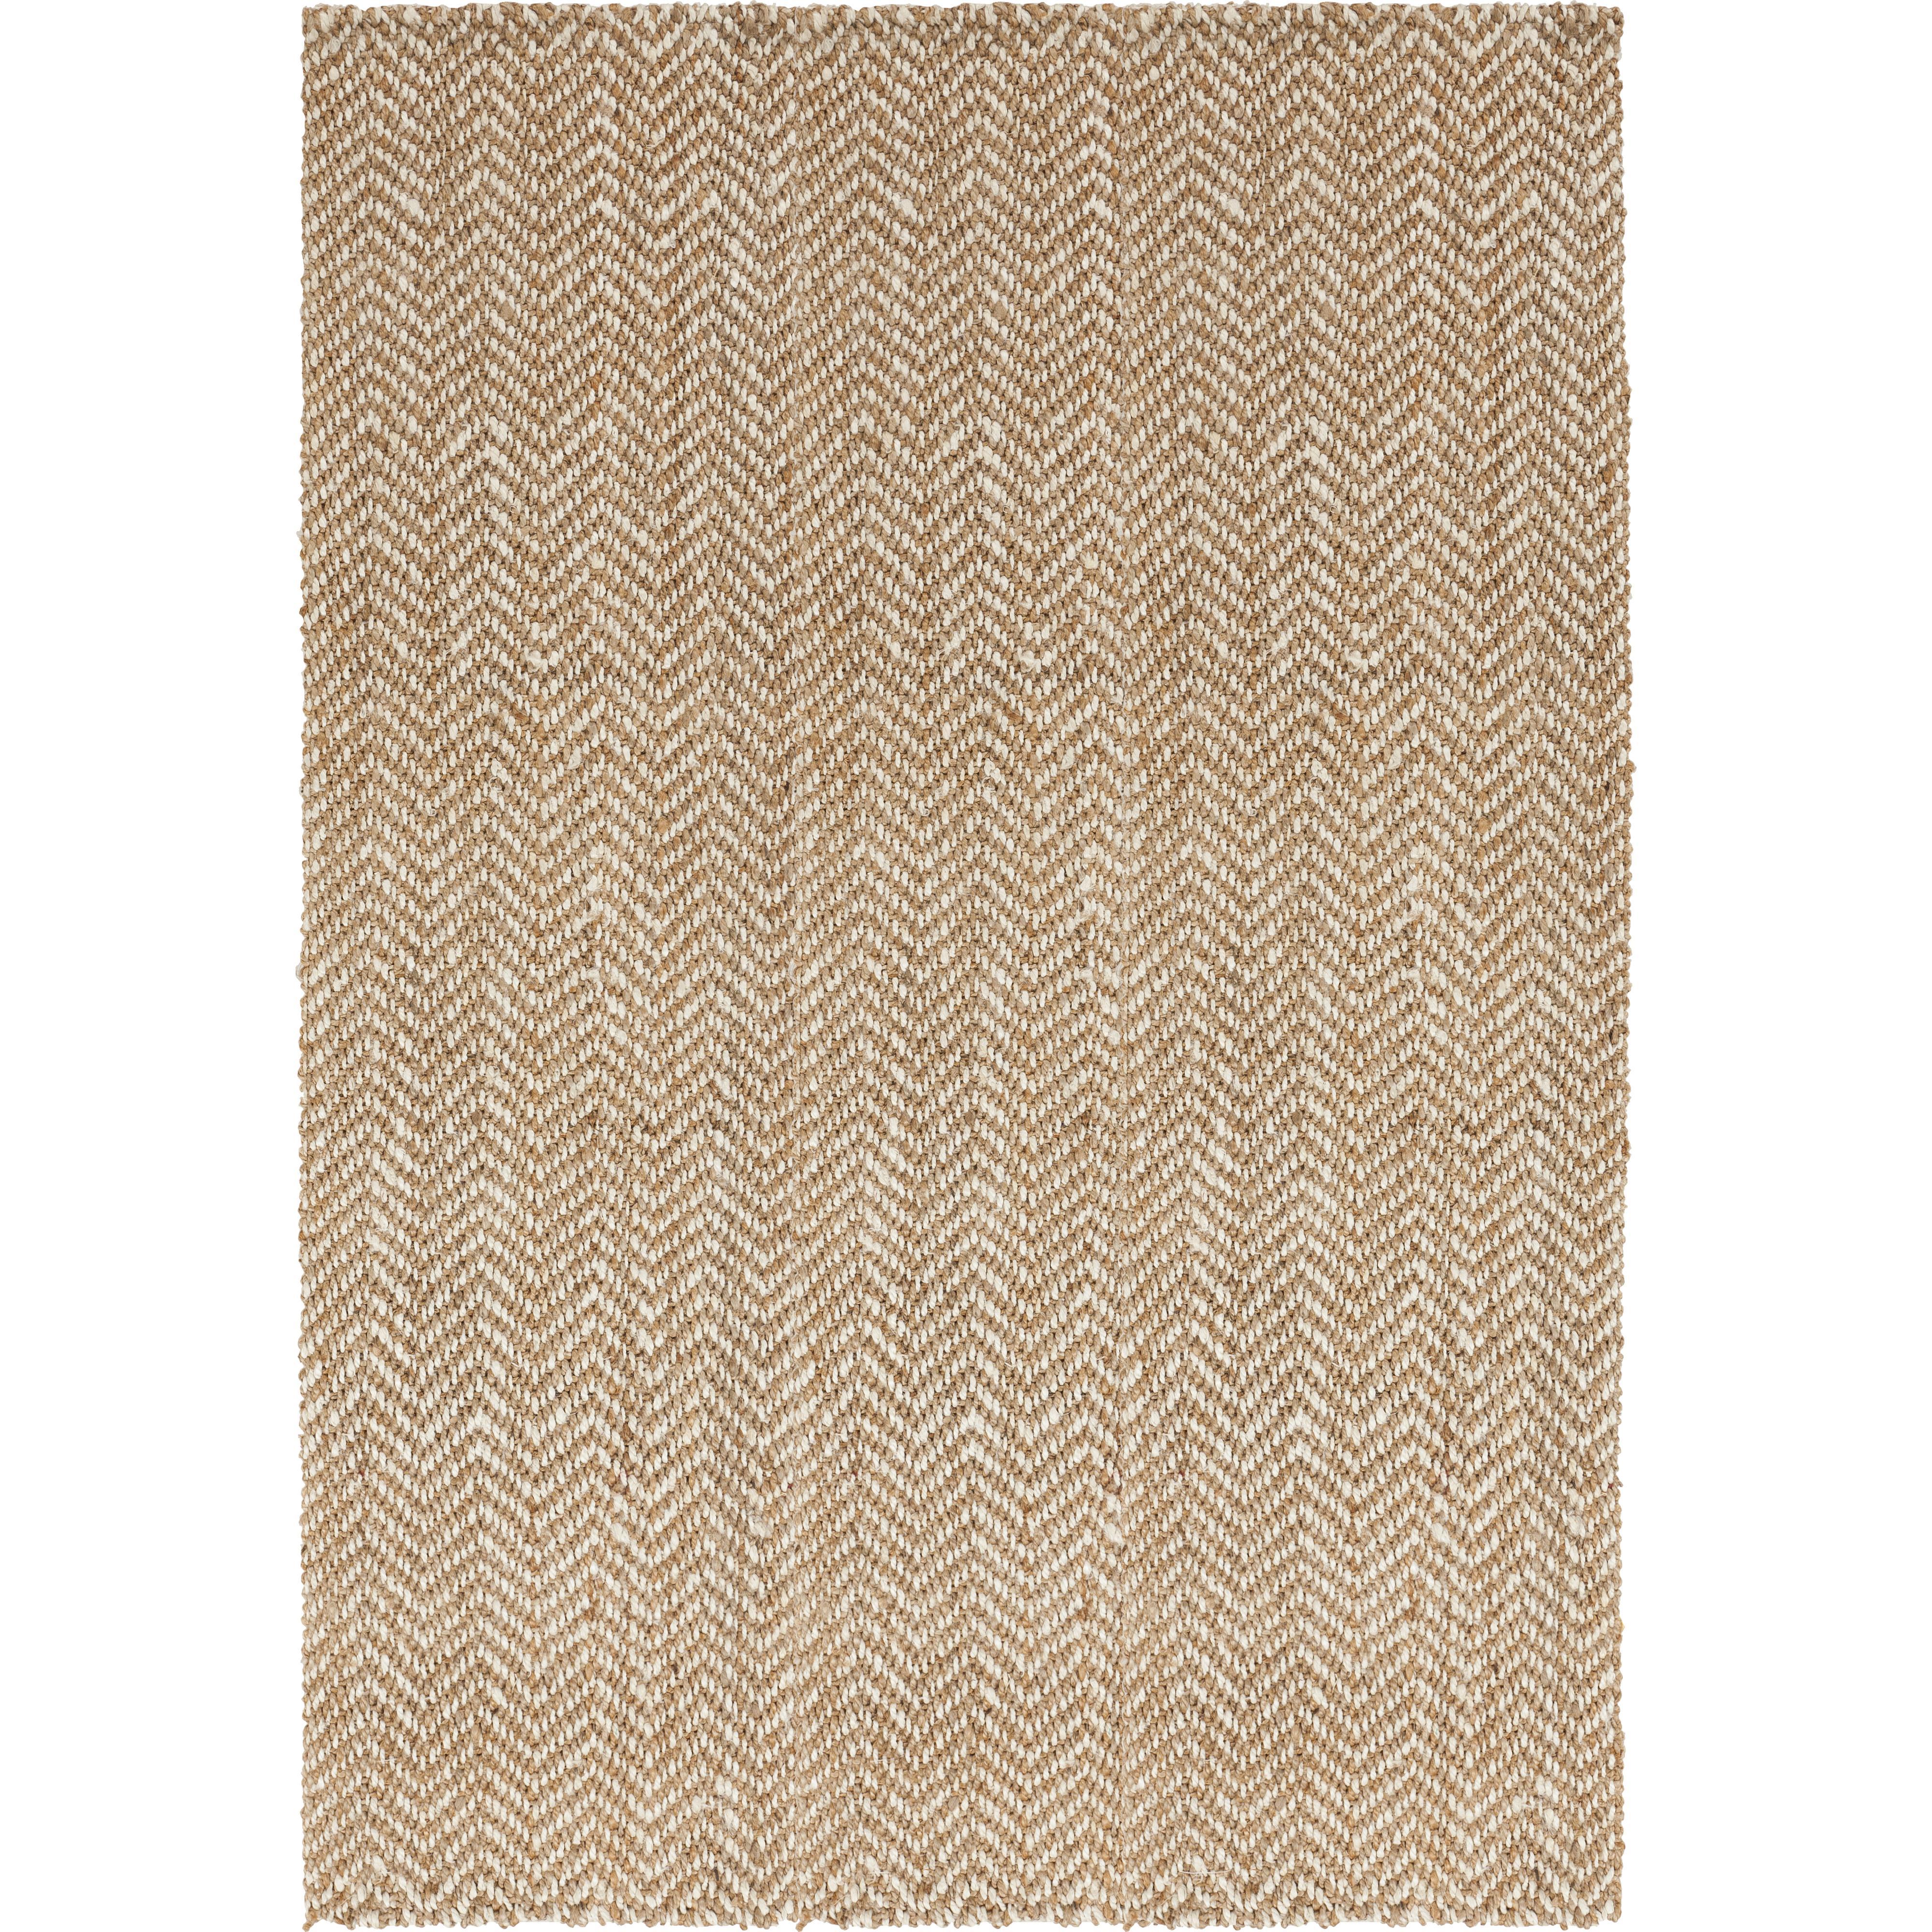 Surya Reeds 5' x 8' - Item Number: REED804-58